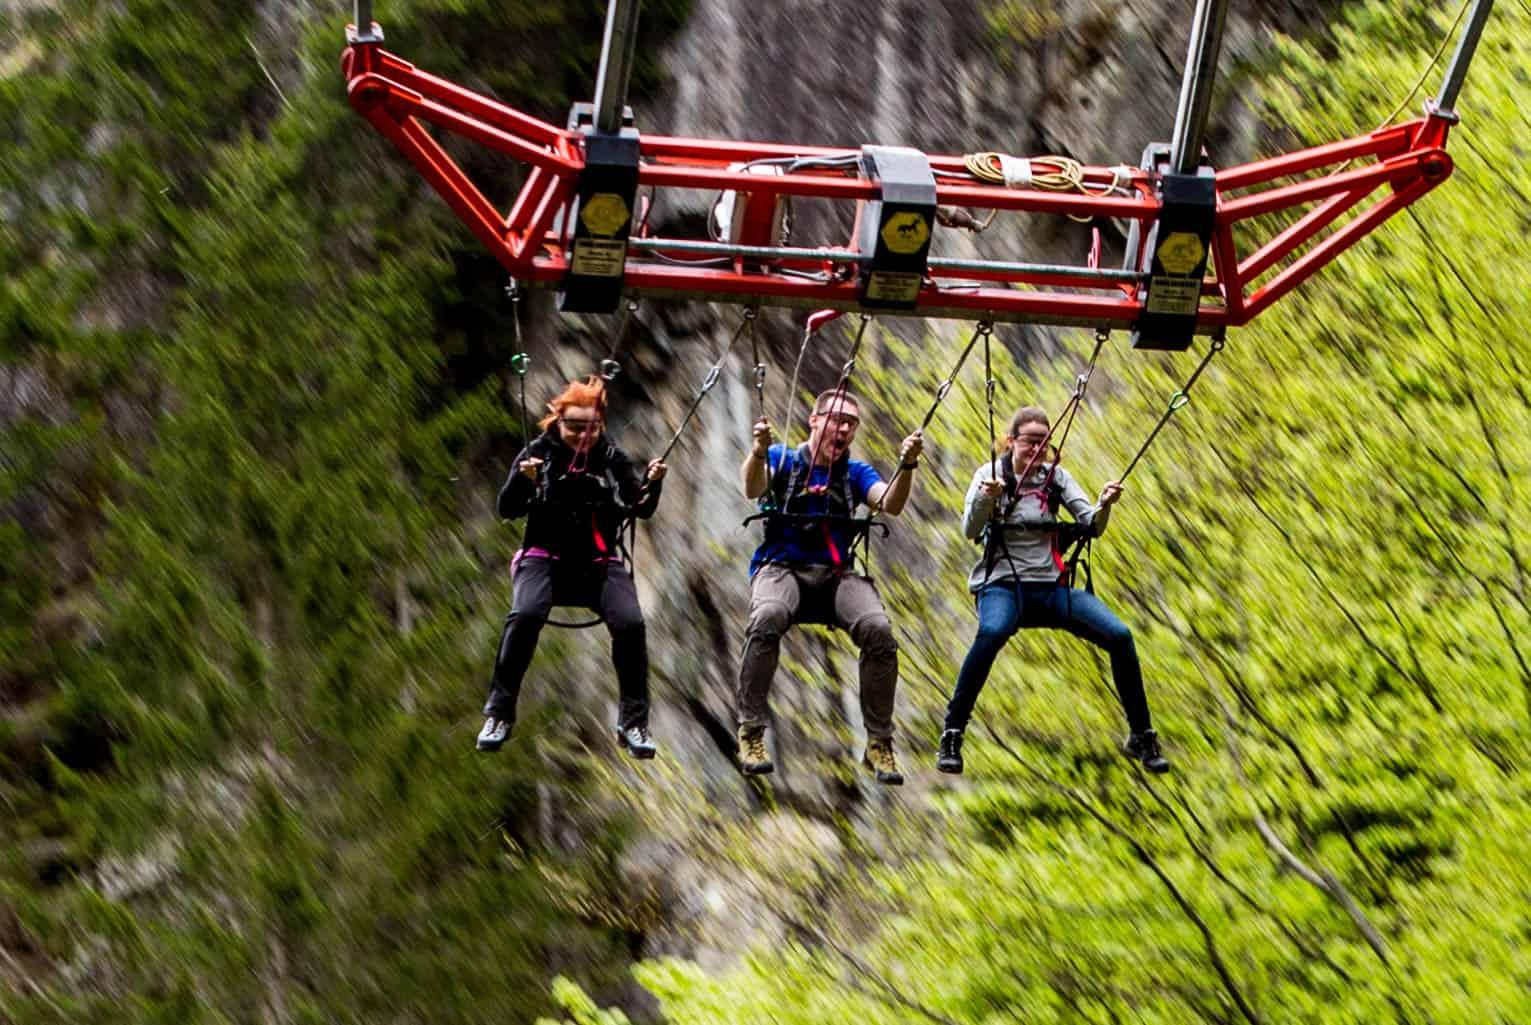 Fit & Fun Outdoor St. Lorenzen Mega Dive Riesenschaukel